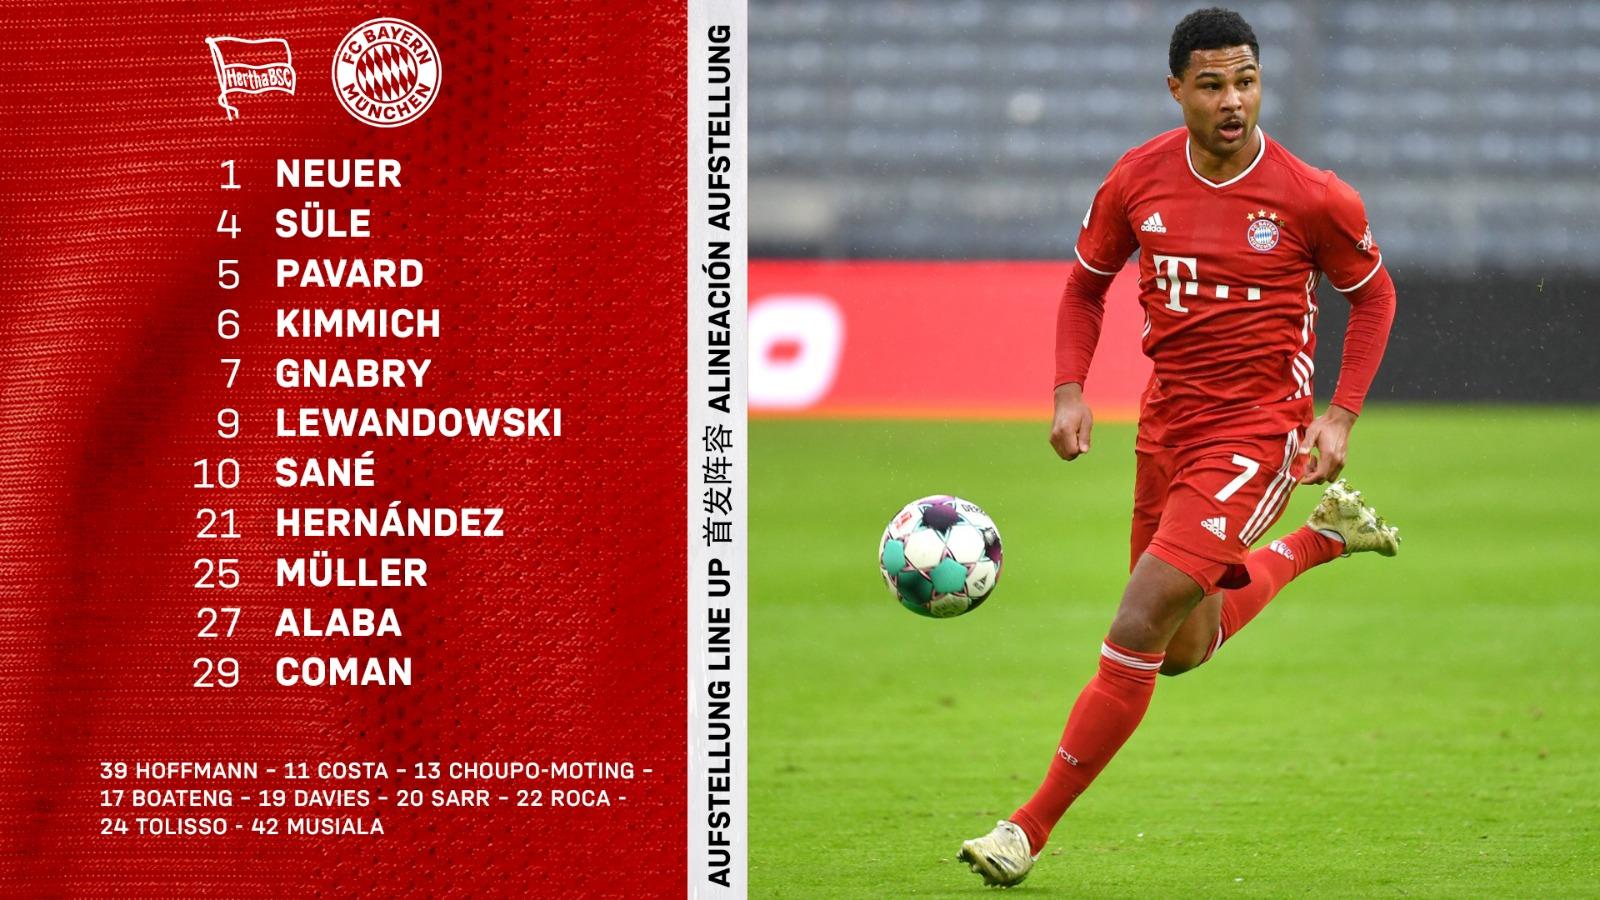 The Bundesliga Thread 20/21  - Page 14 EtexmUFXIAQoFth?format=jpg&name=large